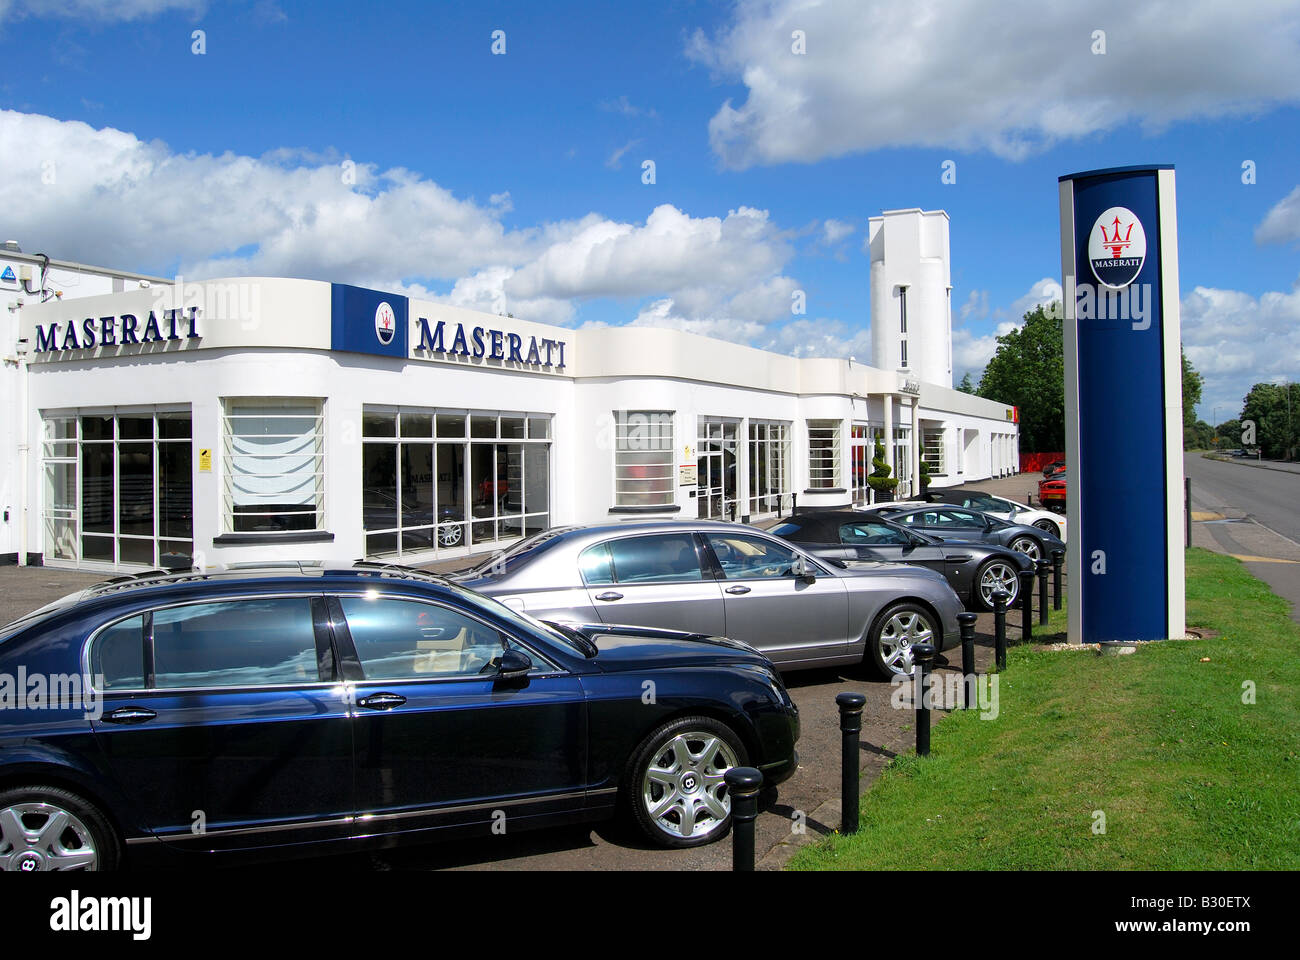 Maserati Car Dealership Egham Surrey England United Kingdom - Maserati car dealership